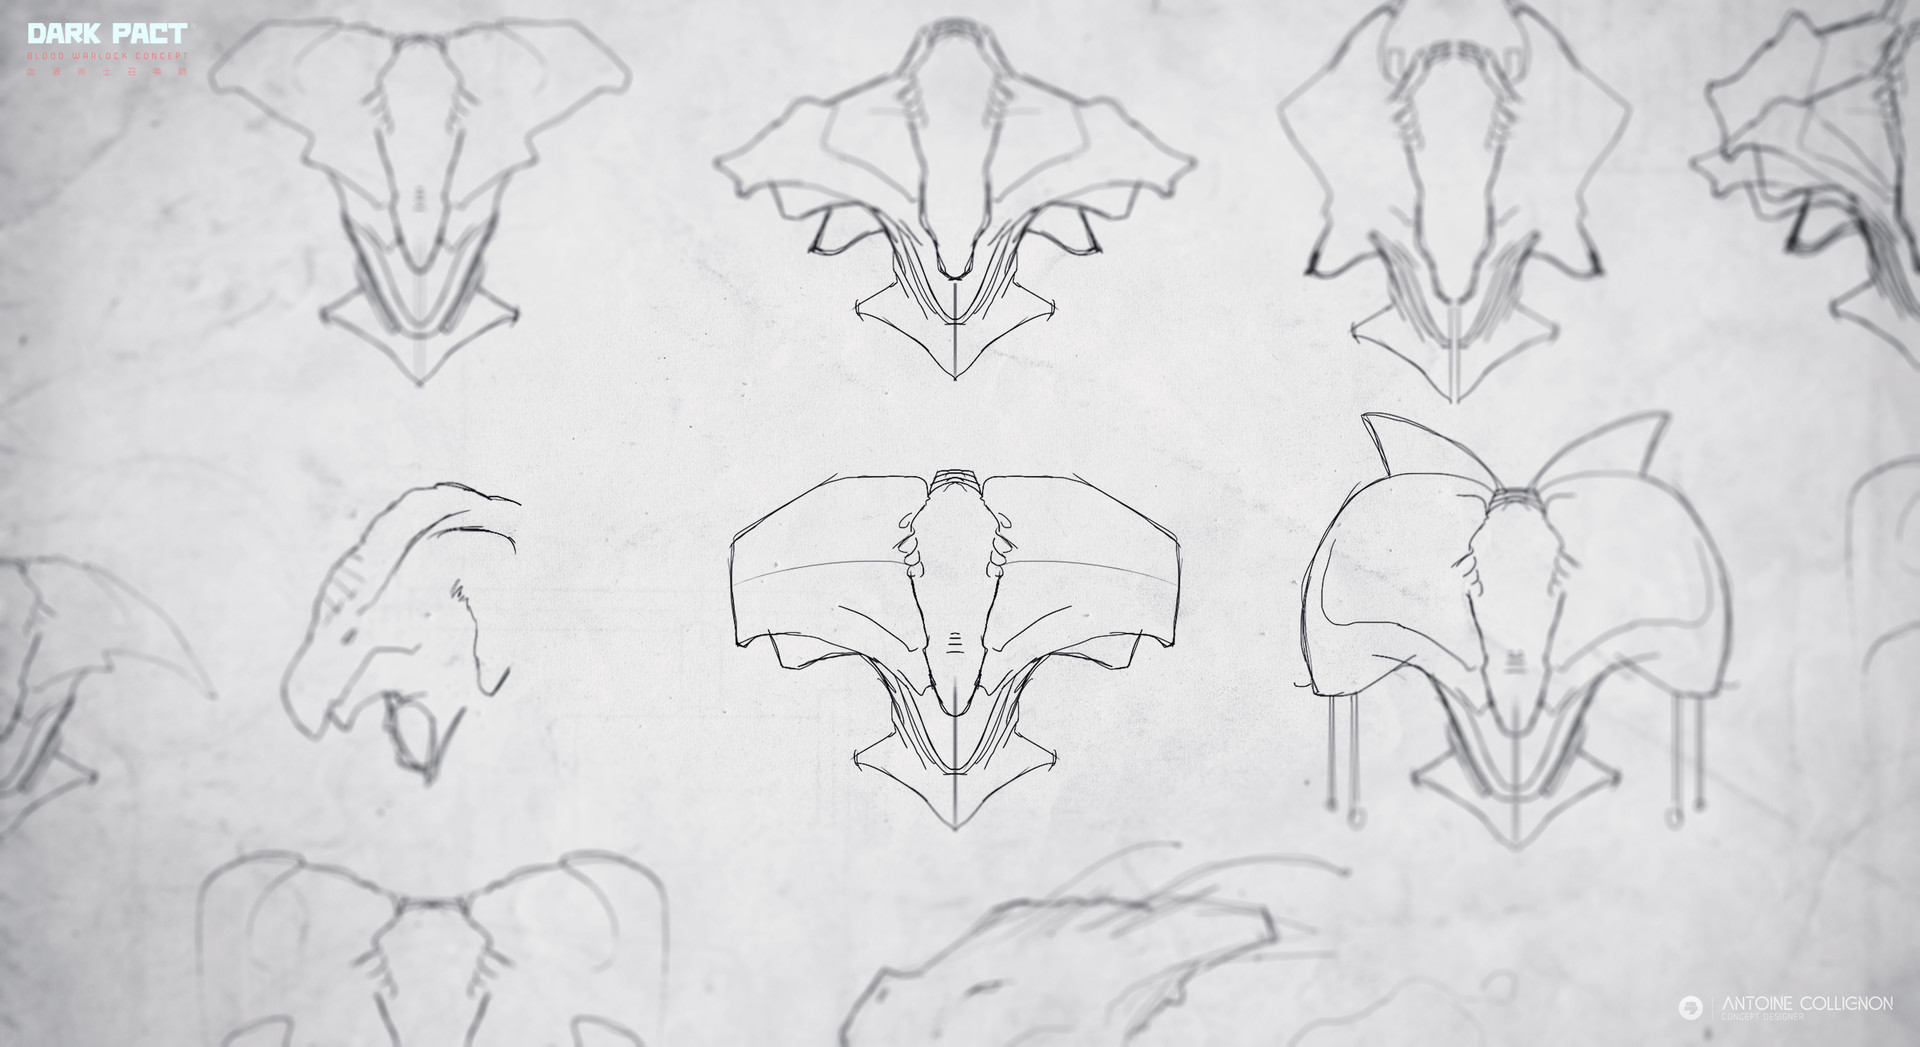 Antoine collignon dark pact characterdesign mmo bloodwarlock by antoine collignon 8